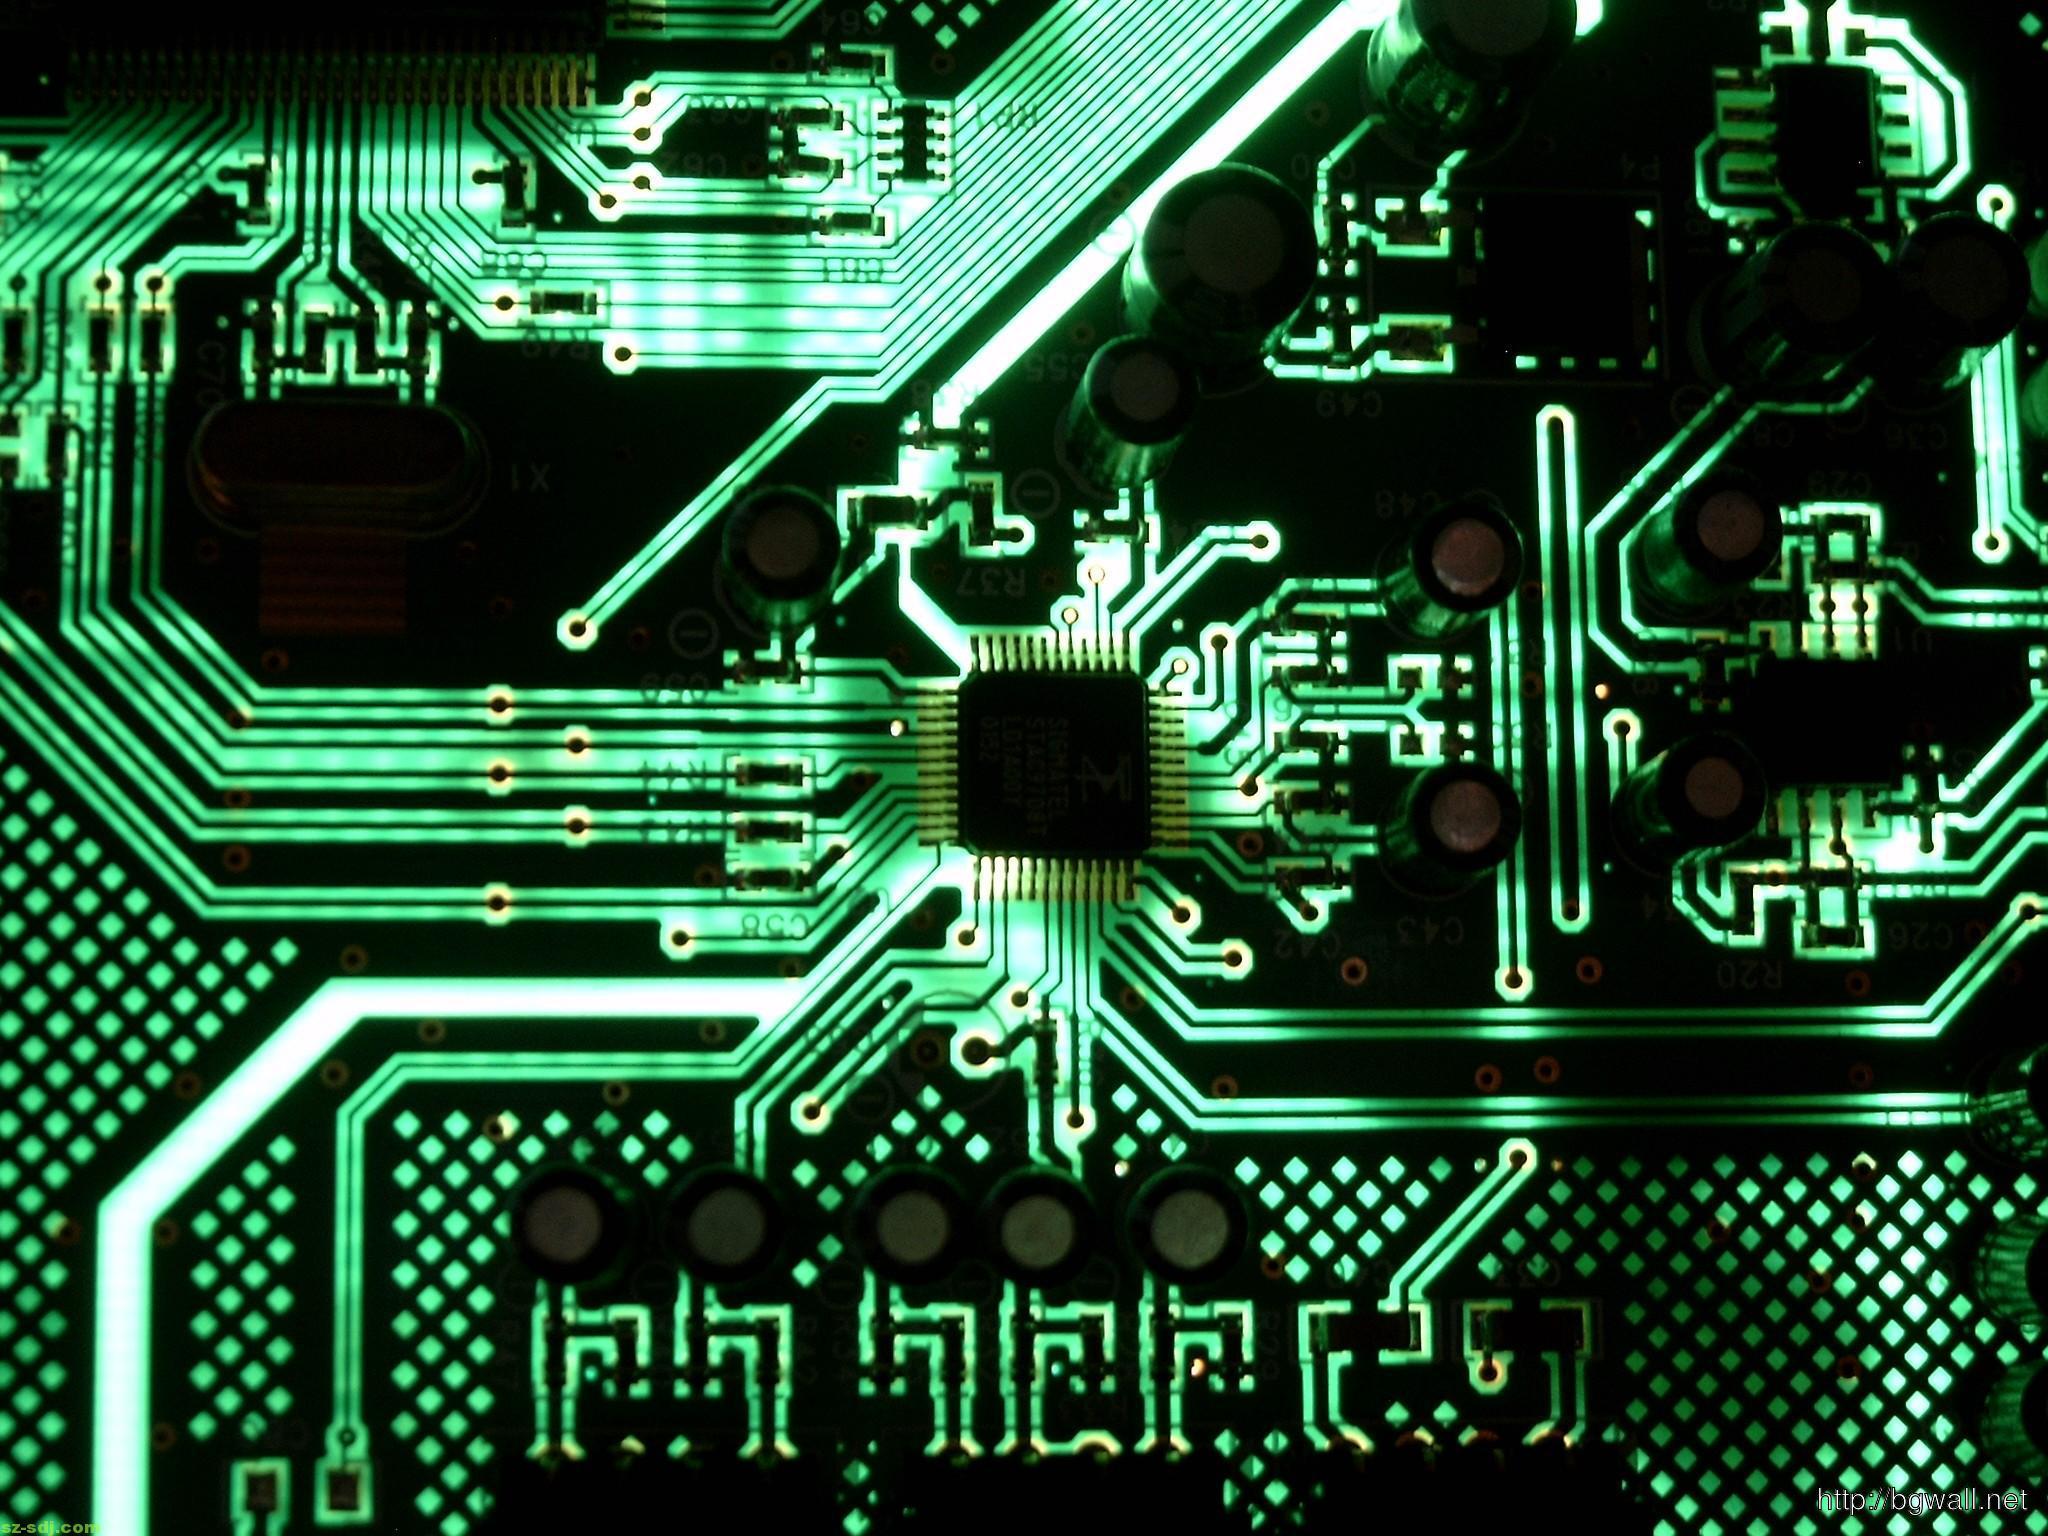 Hd Motorcycle Wallpaper Widescreen Green Motherboard Circuit Wallpaper Image Hd Background